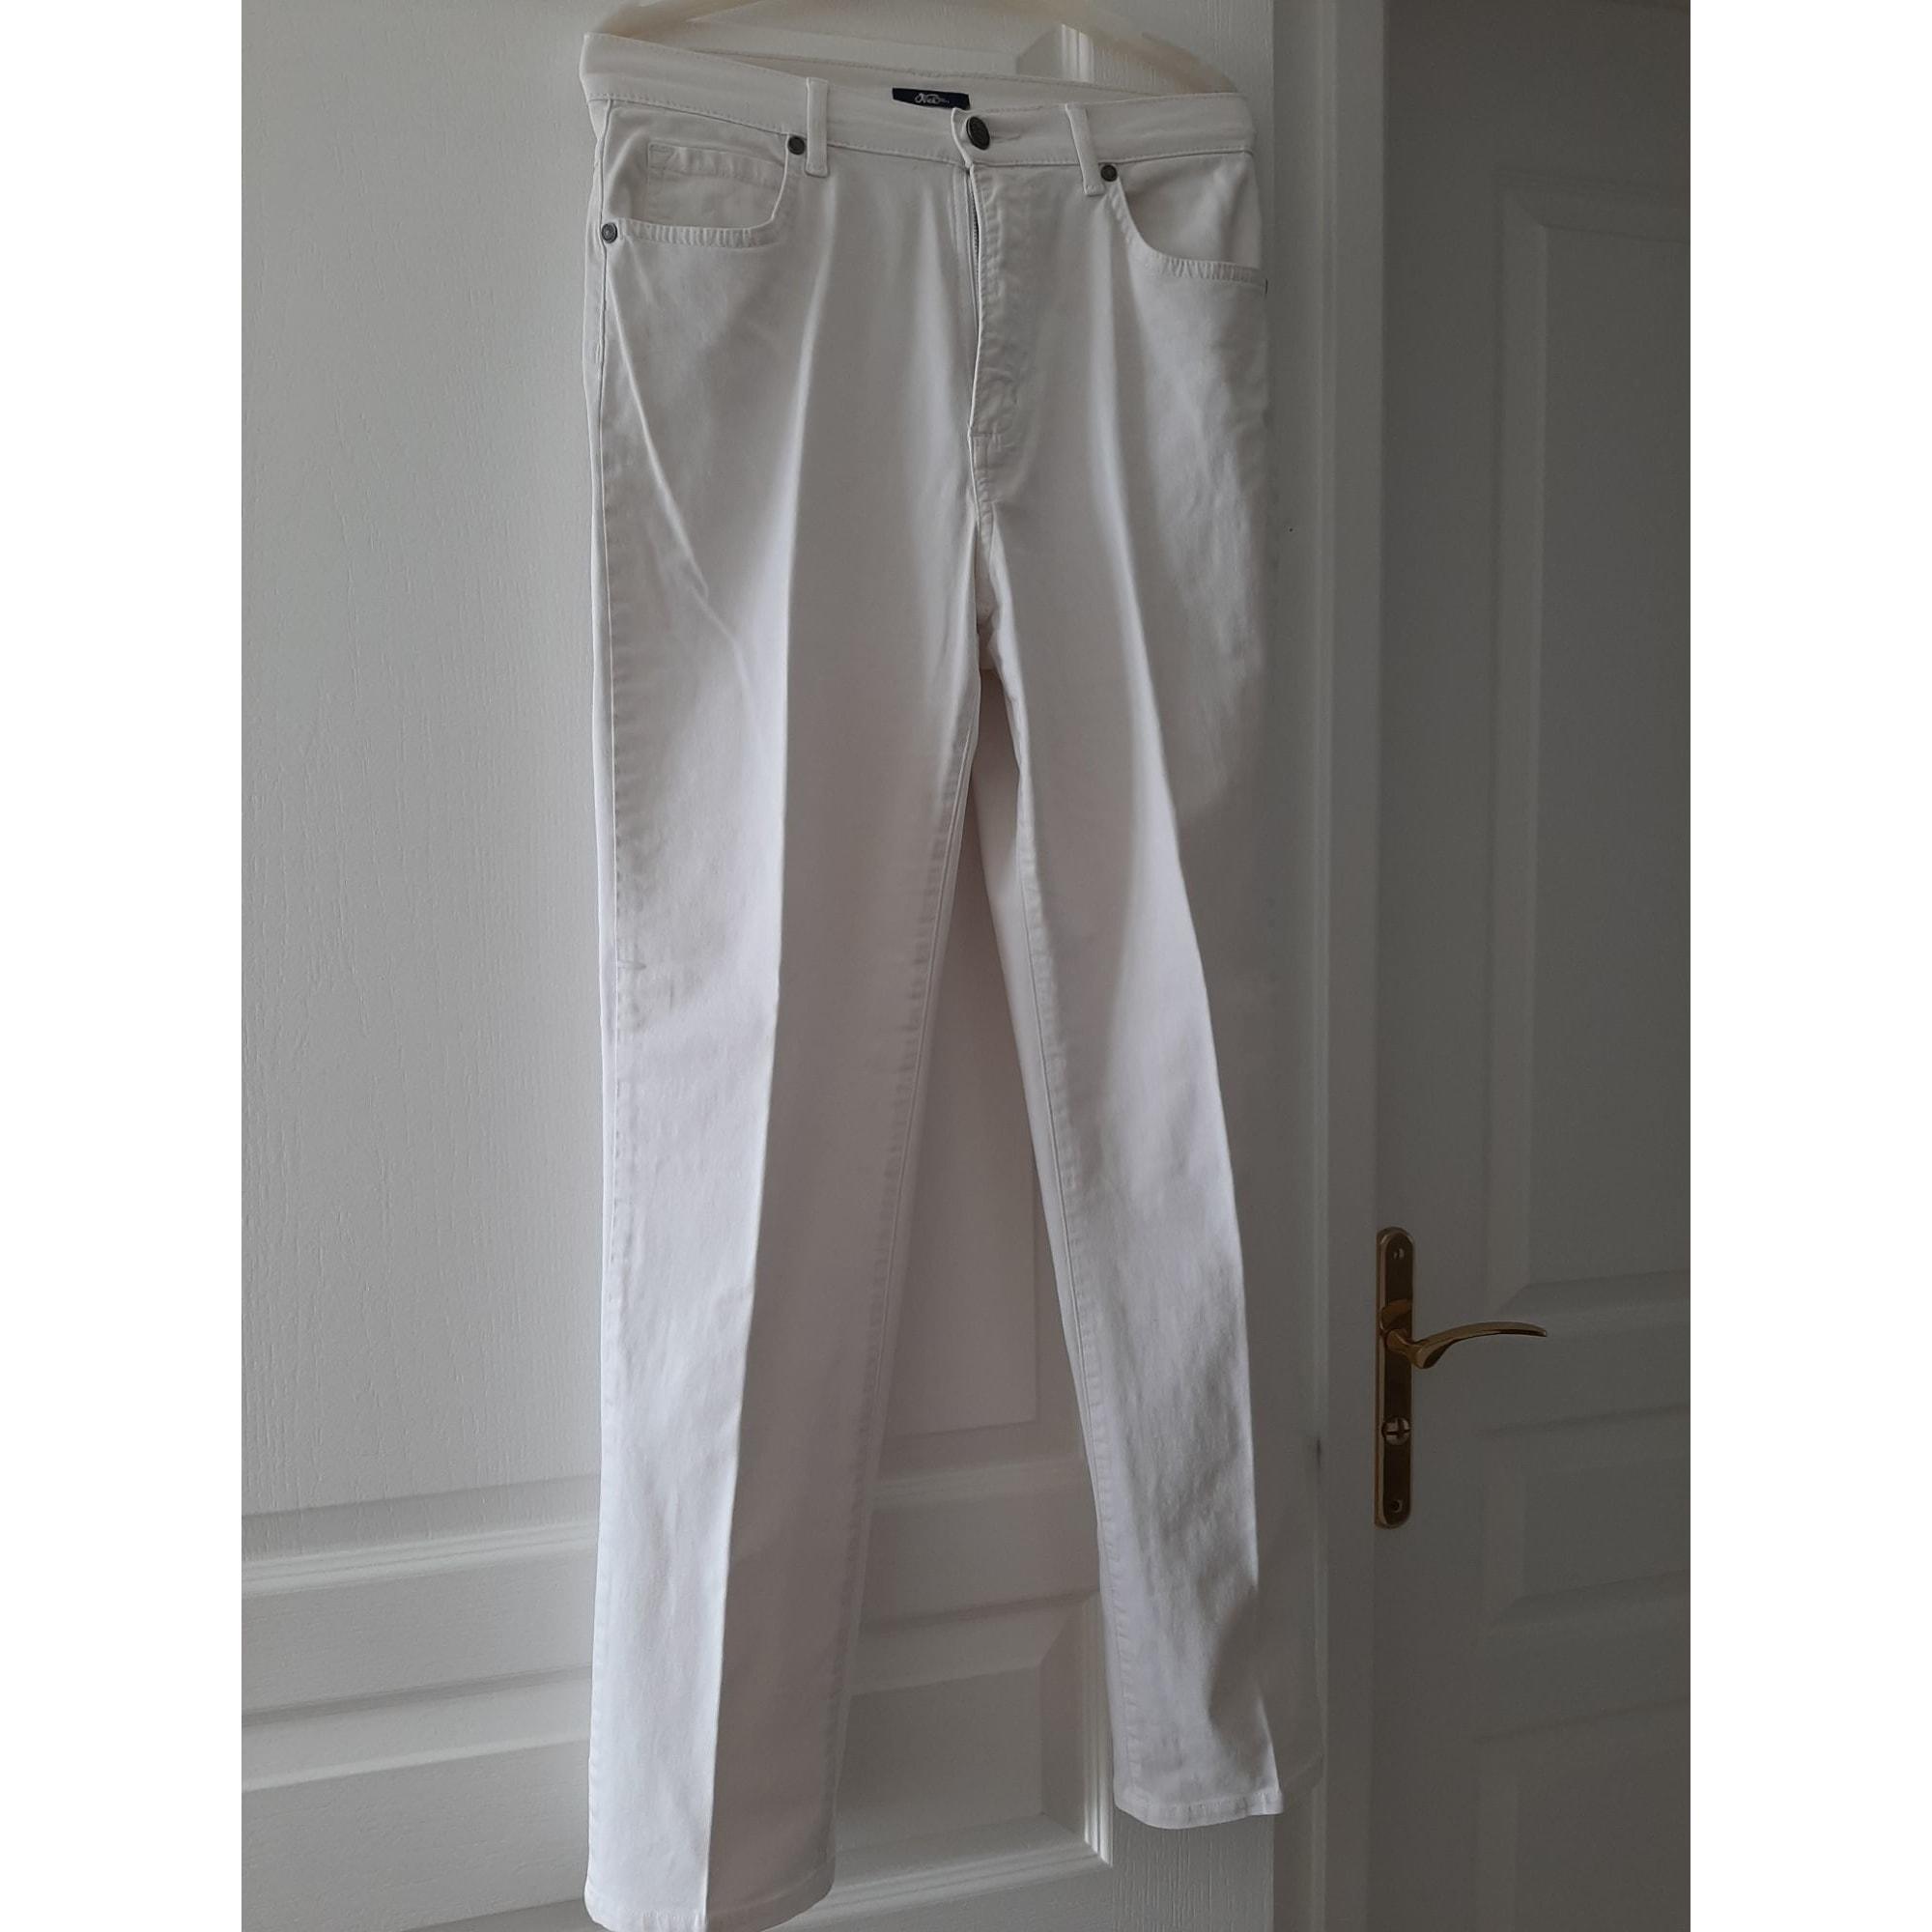 Pantalon droit OBER Blanc, blanc cassé, écru